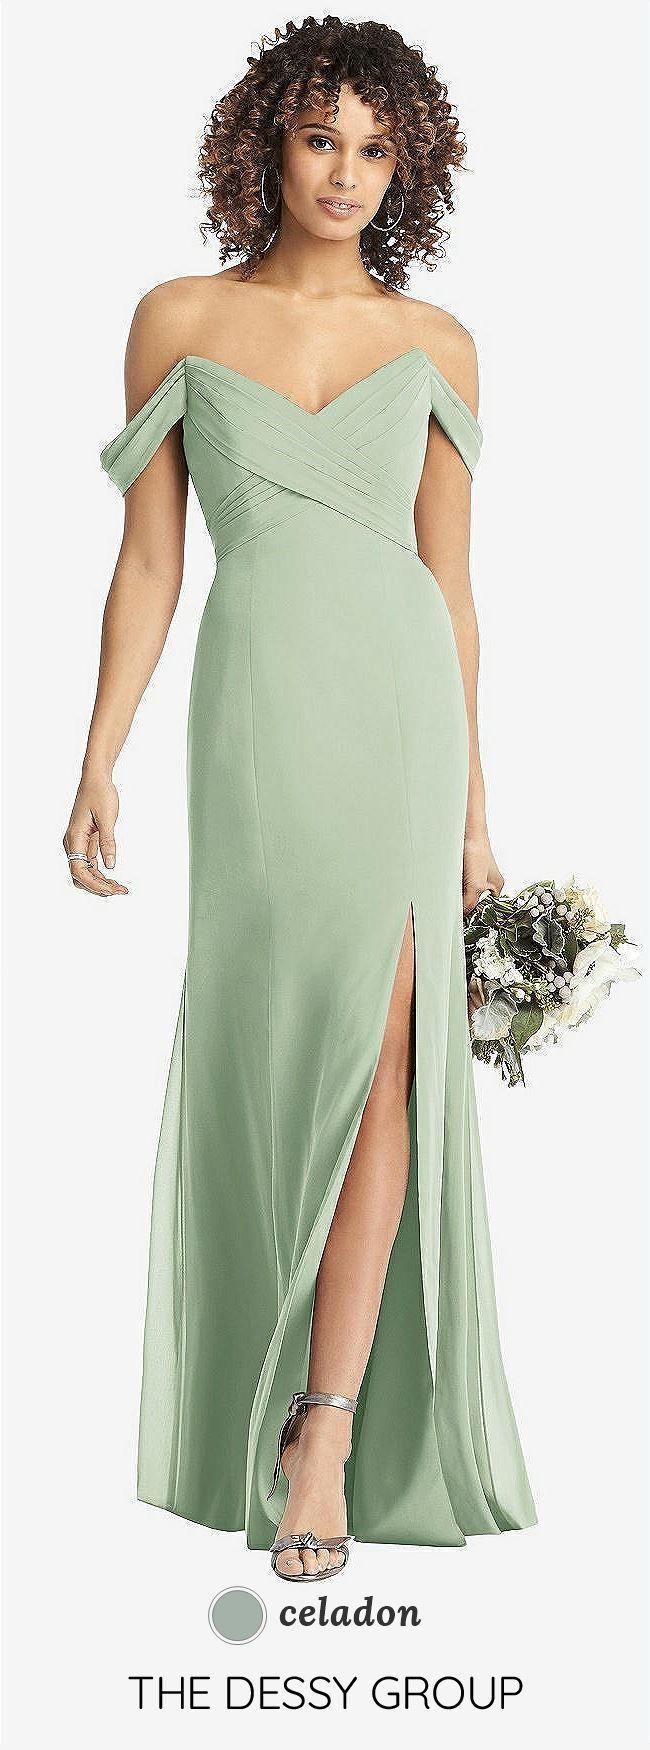 Fresh Mint Green Bridesmaid Dresses Mint Green Bridesmaid Dresses Green Bridesmaid Dresses Bridesmaid Dresses With Sleeves [ 1750 x 650 Pixel ]